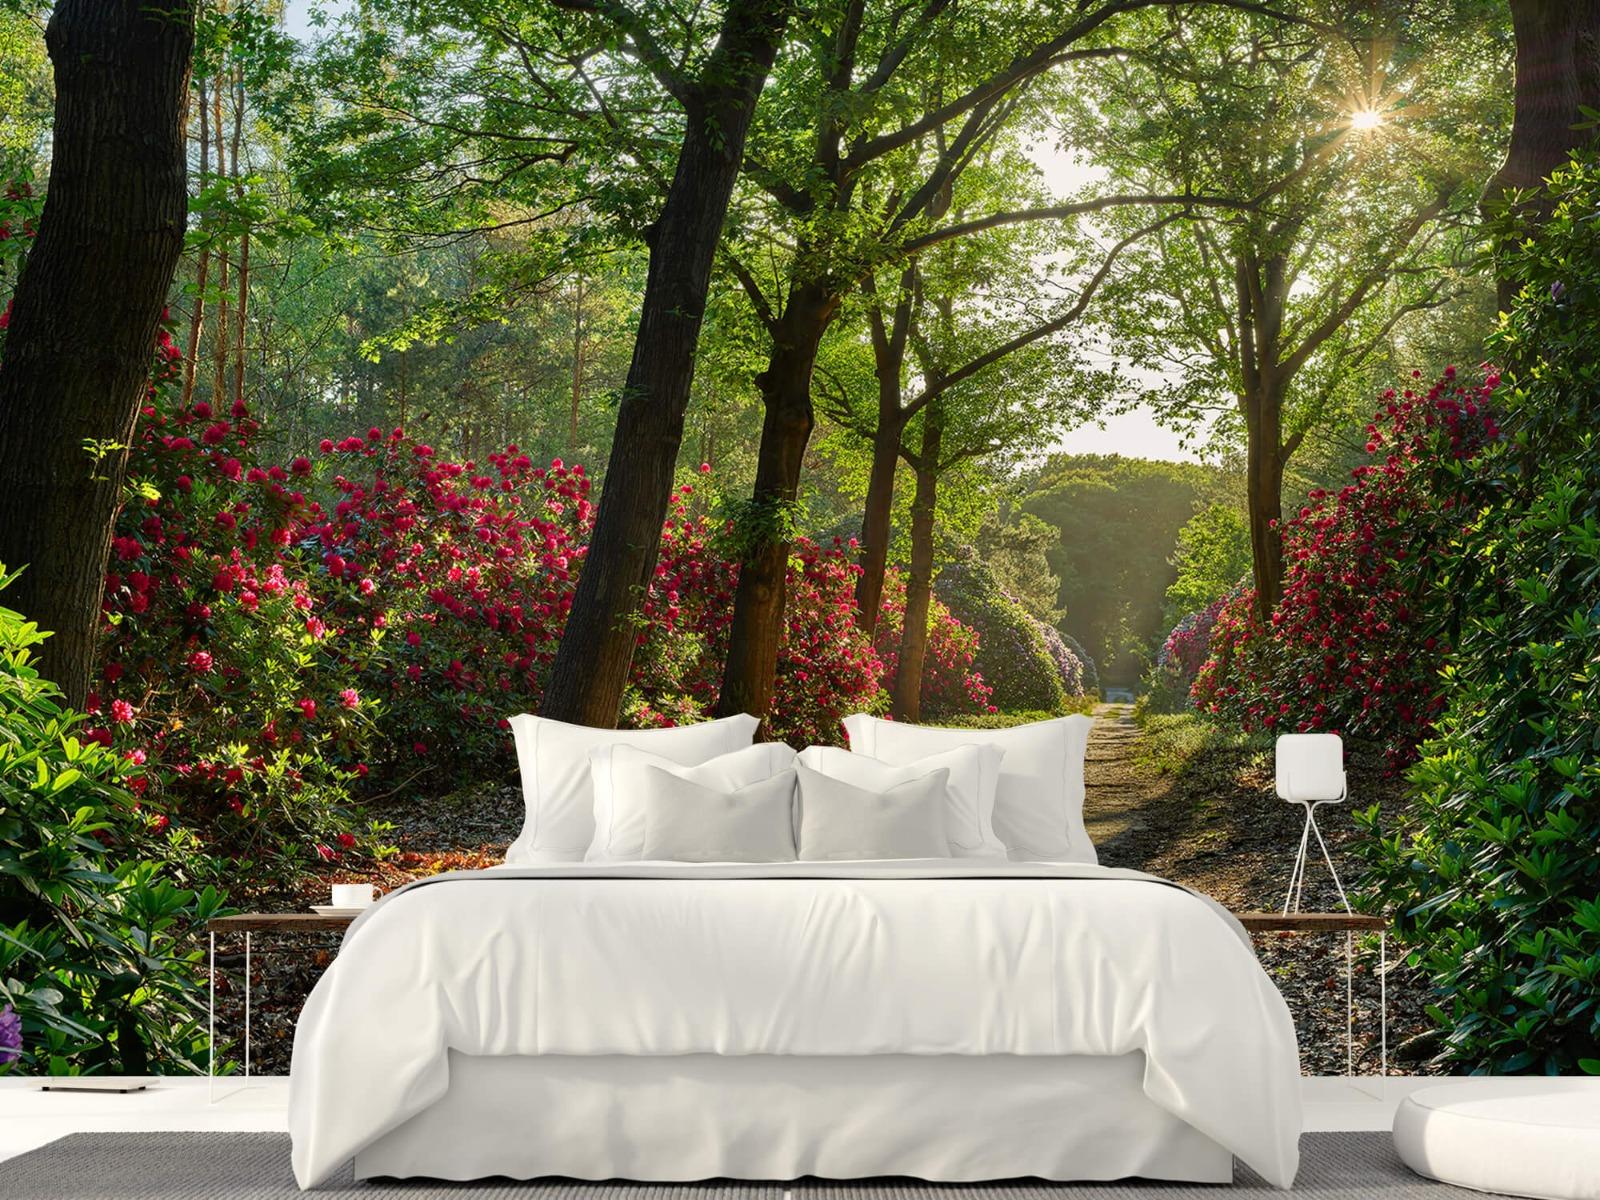 Bos - Zonsopkomst bij pad met rhododendrons 23